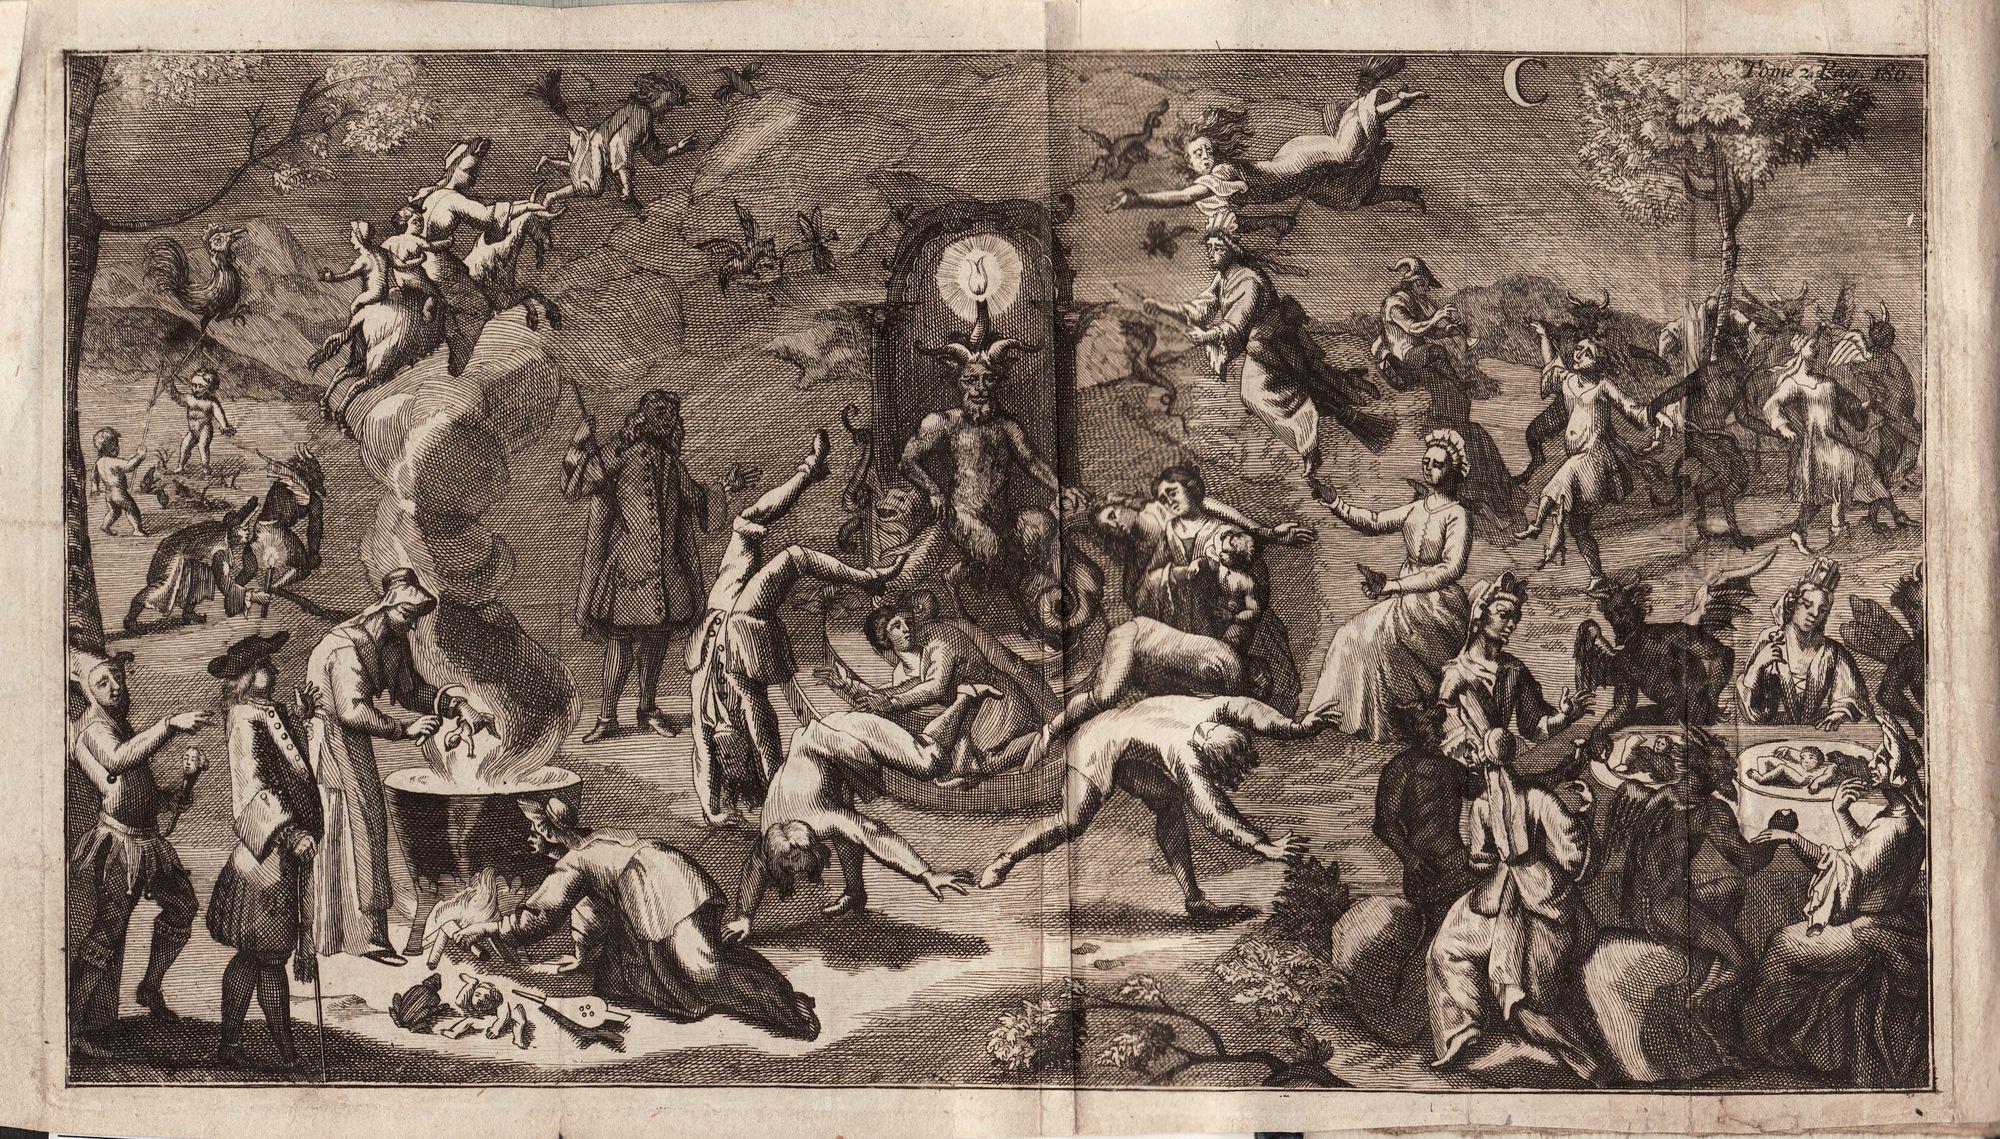 Duivels en heksen